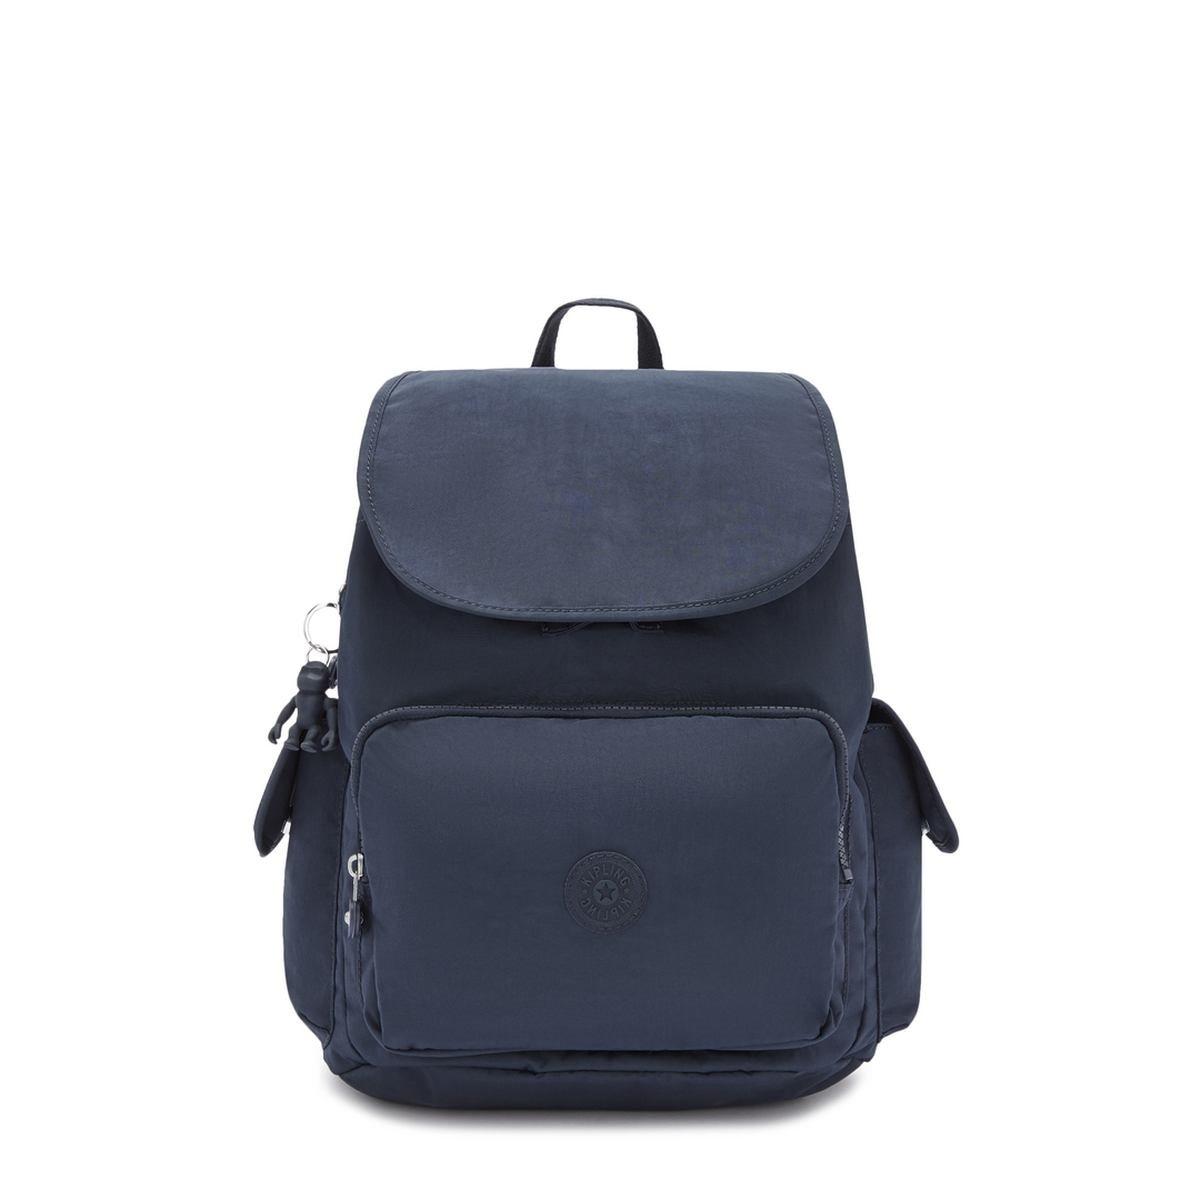 Kipling Τσάντα πλάτης 37x27x16cm City Packs Blue